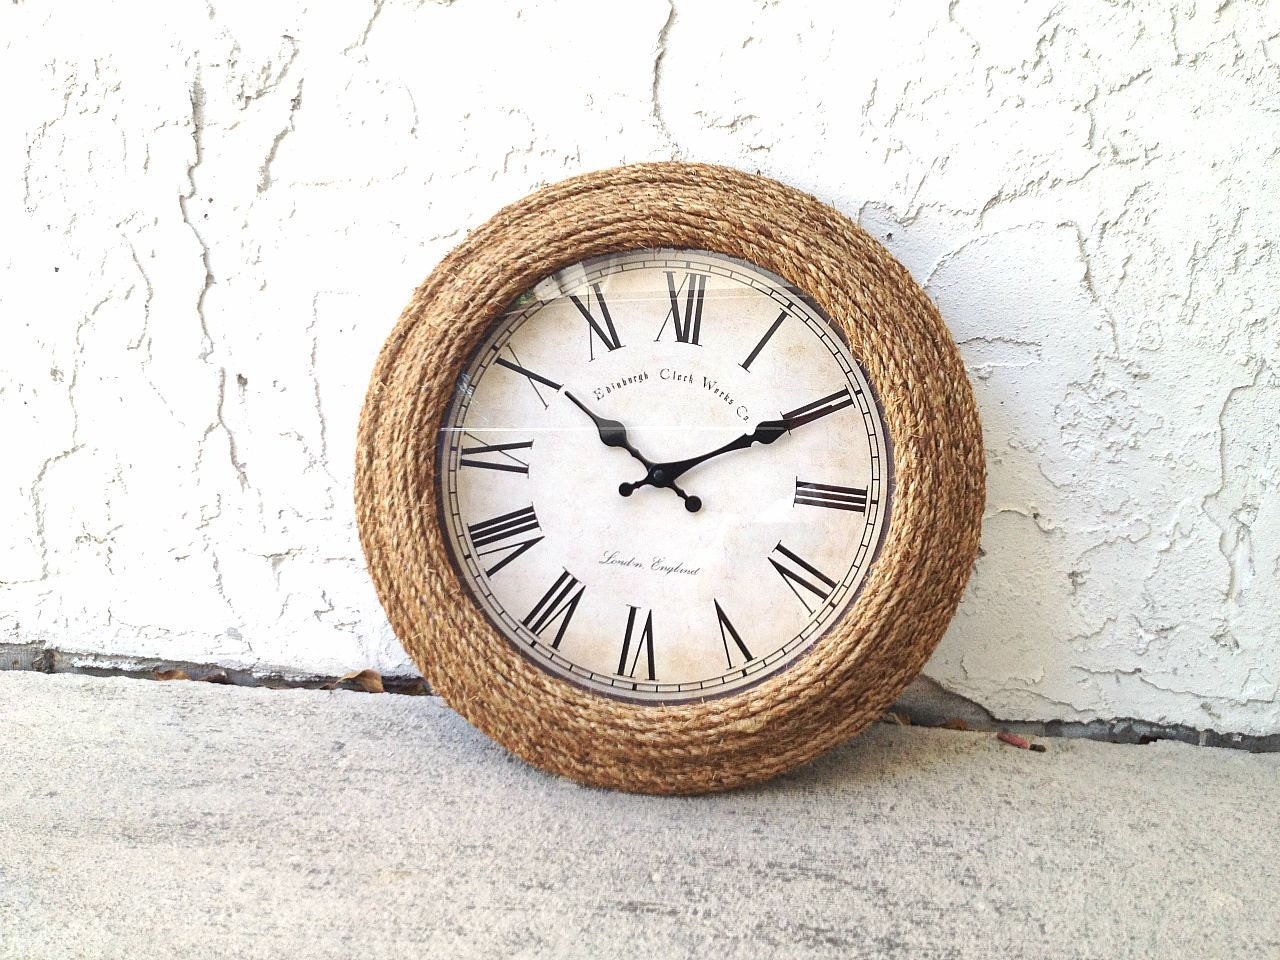 sale 20 manila rope clock coastal decor beach chic. Black Bedroom Furniture Sets. Home Design Ideas